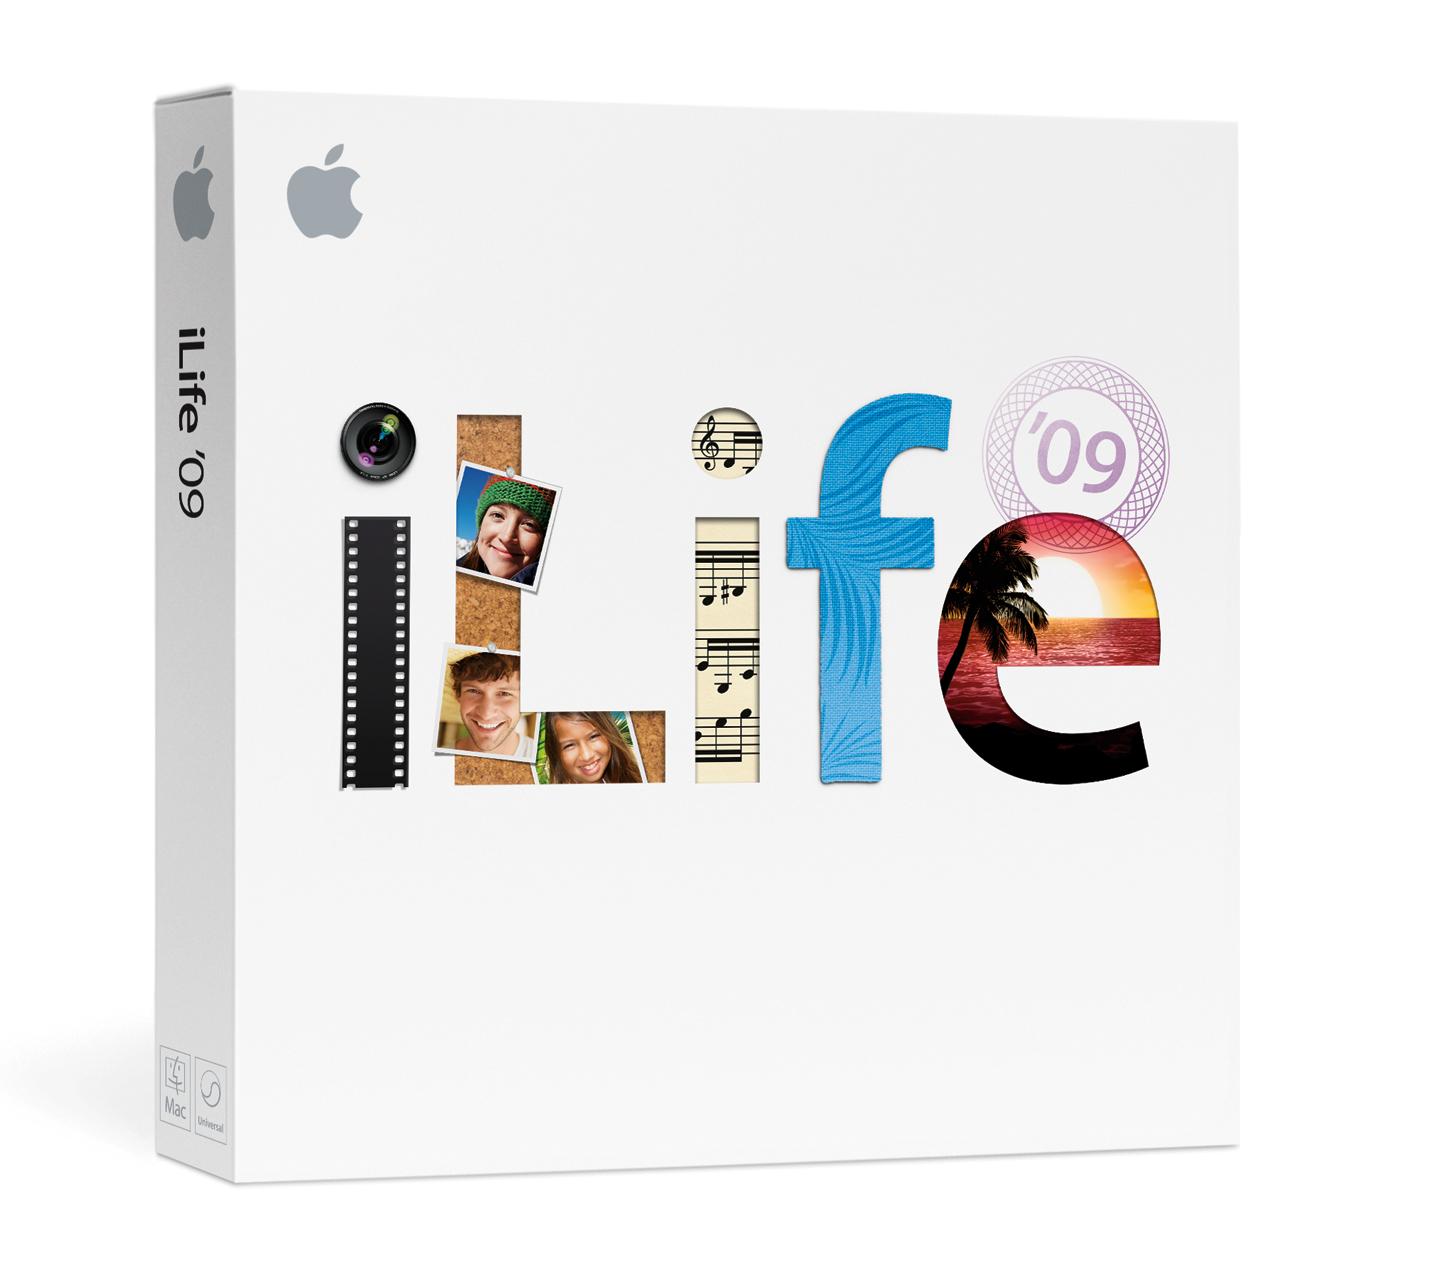 iLife 2009